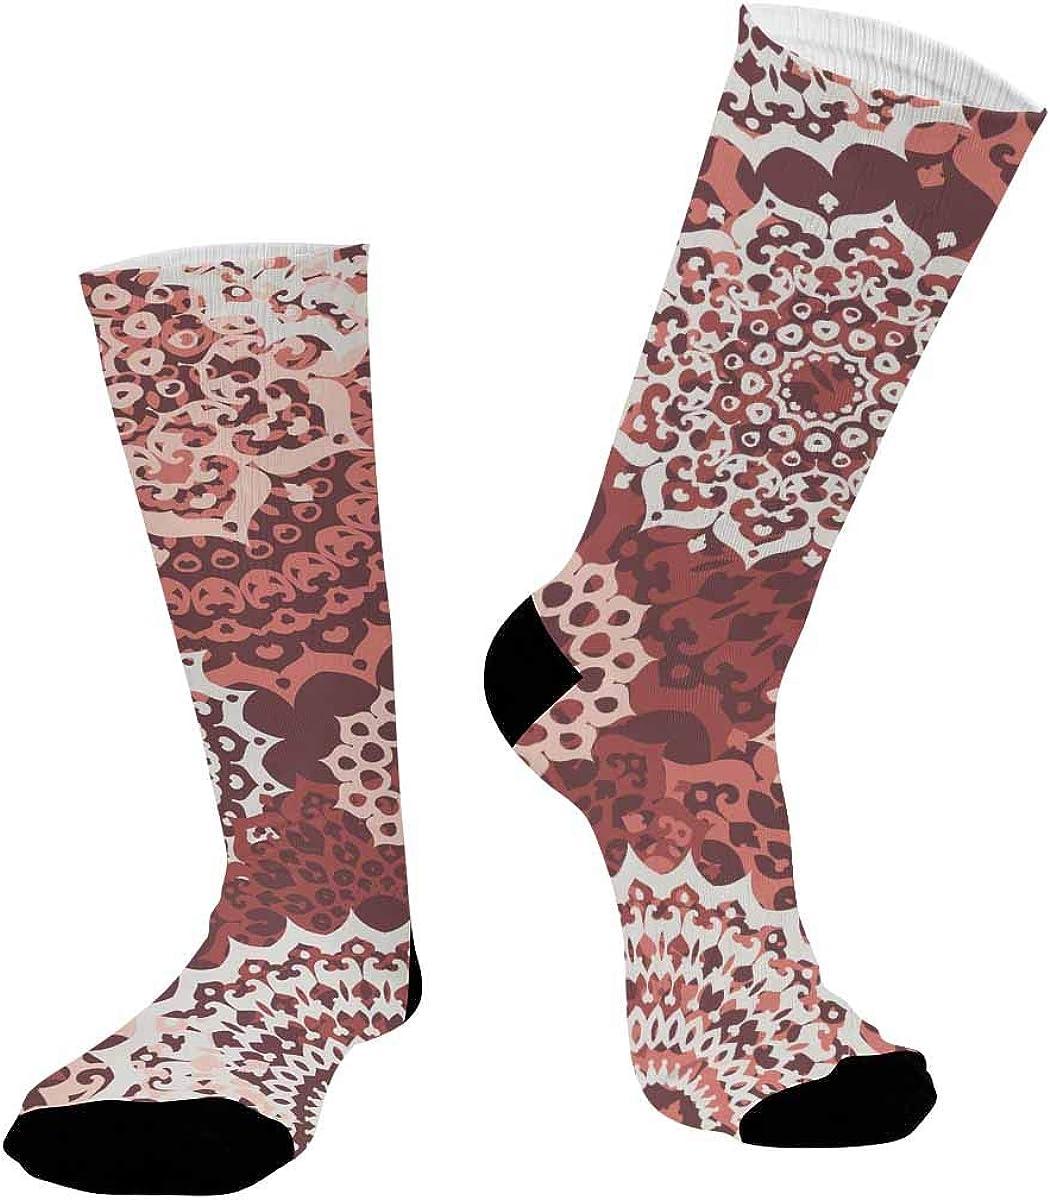 INTERESTPRINT Breathable Sublimated Crew Socks Outdoor Athletic Socks Oriental Mandalas